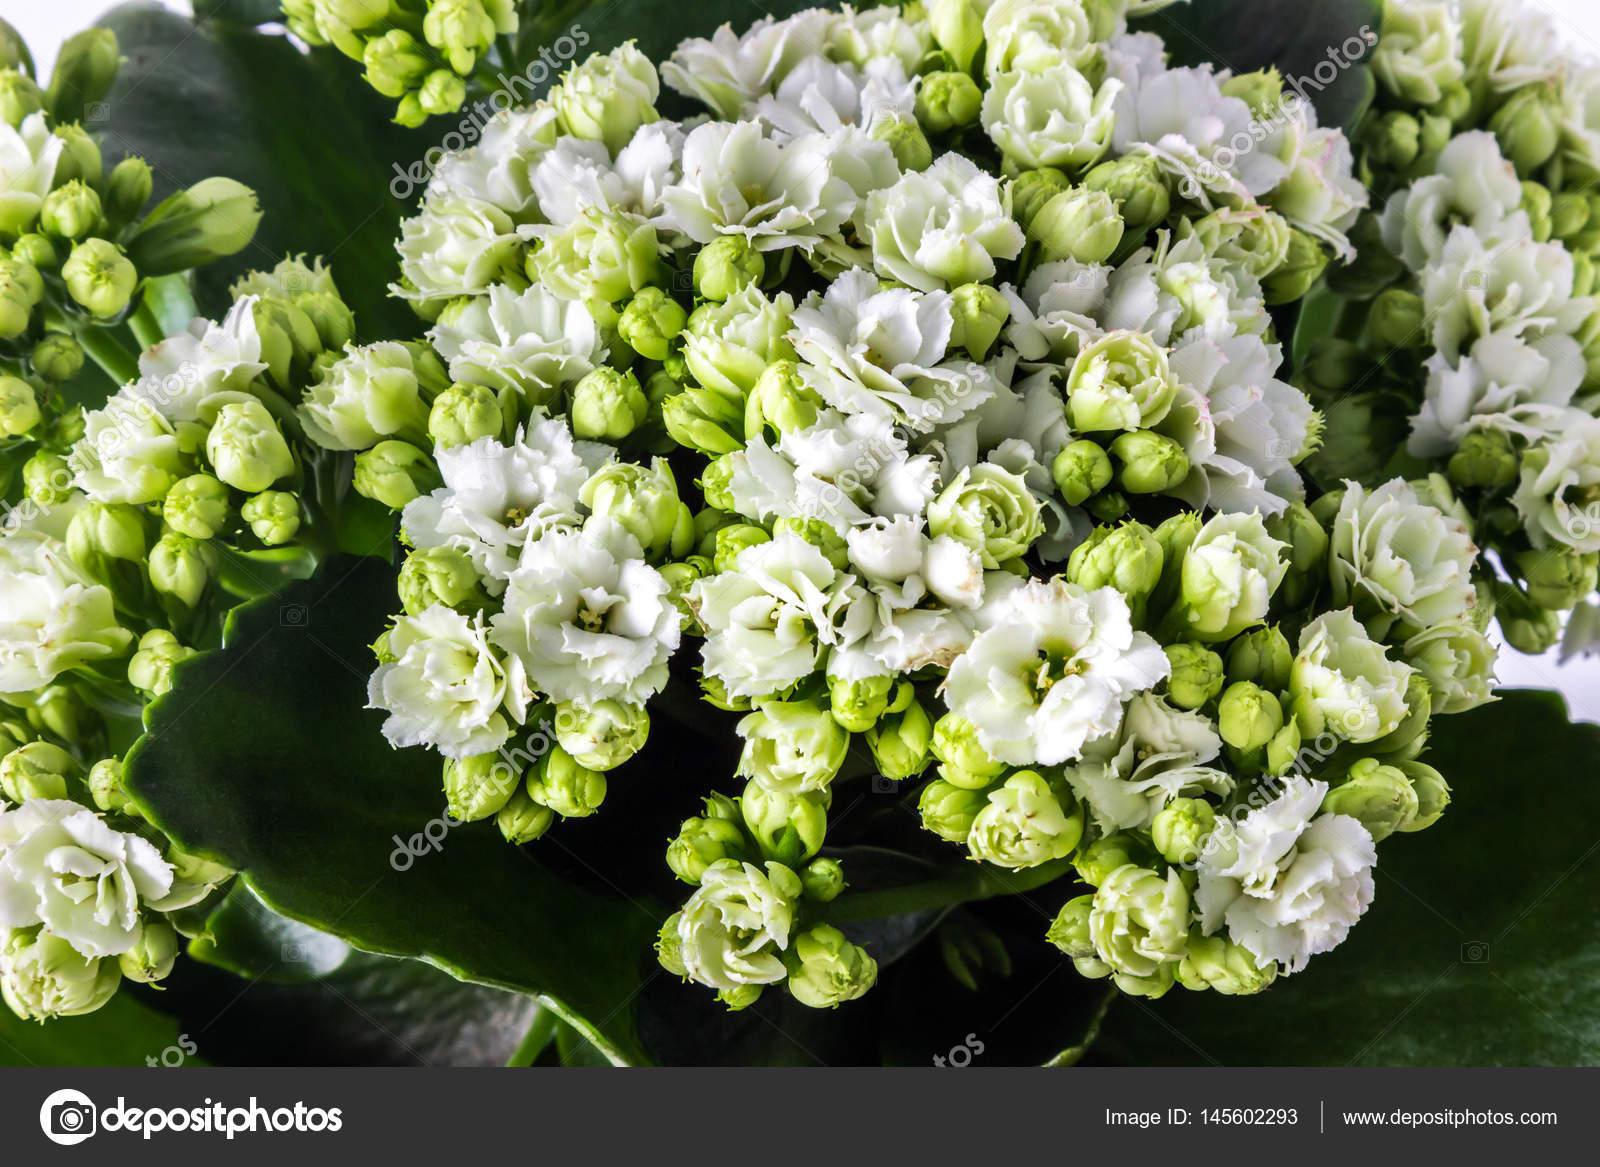 Kalanchoe Fiori Bianchi.Blossoming Of White Flowers Of Kalanchoe Calandiva Stock Photo